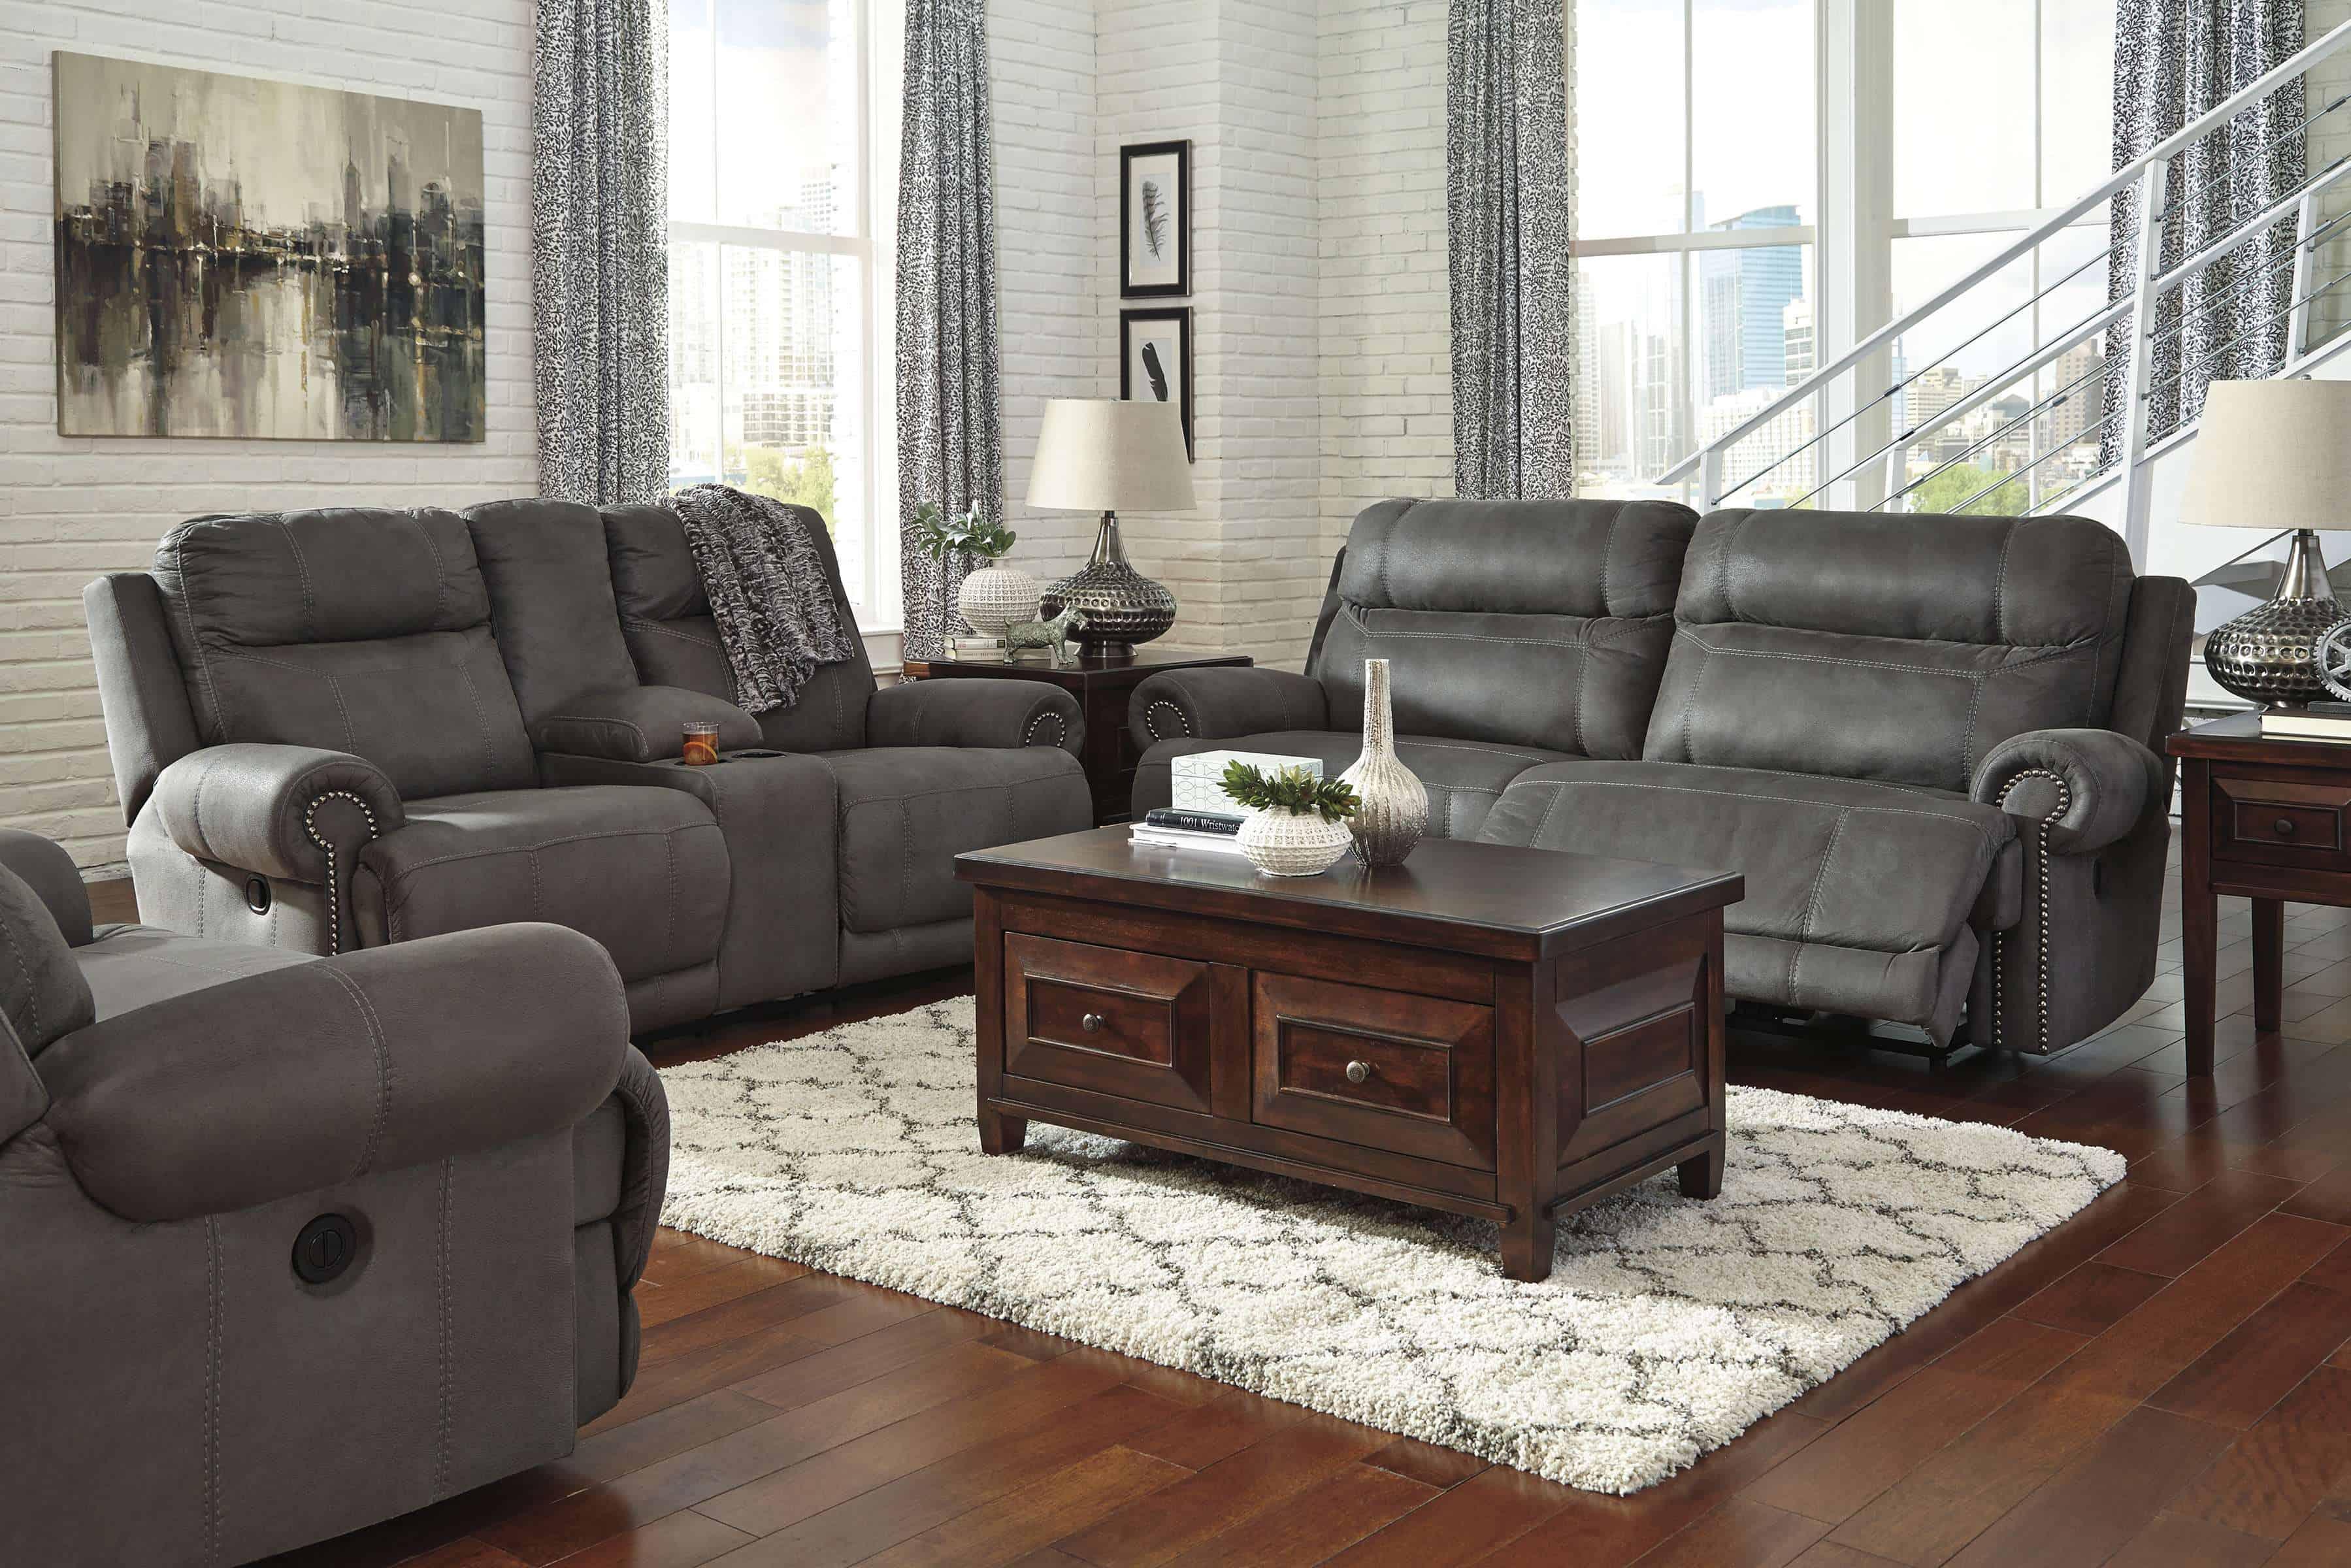 Ashley Furniture Signature Design Austere Power Oversized Recliner -3